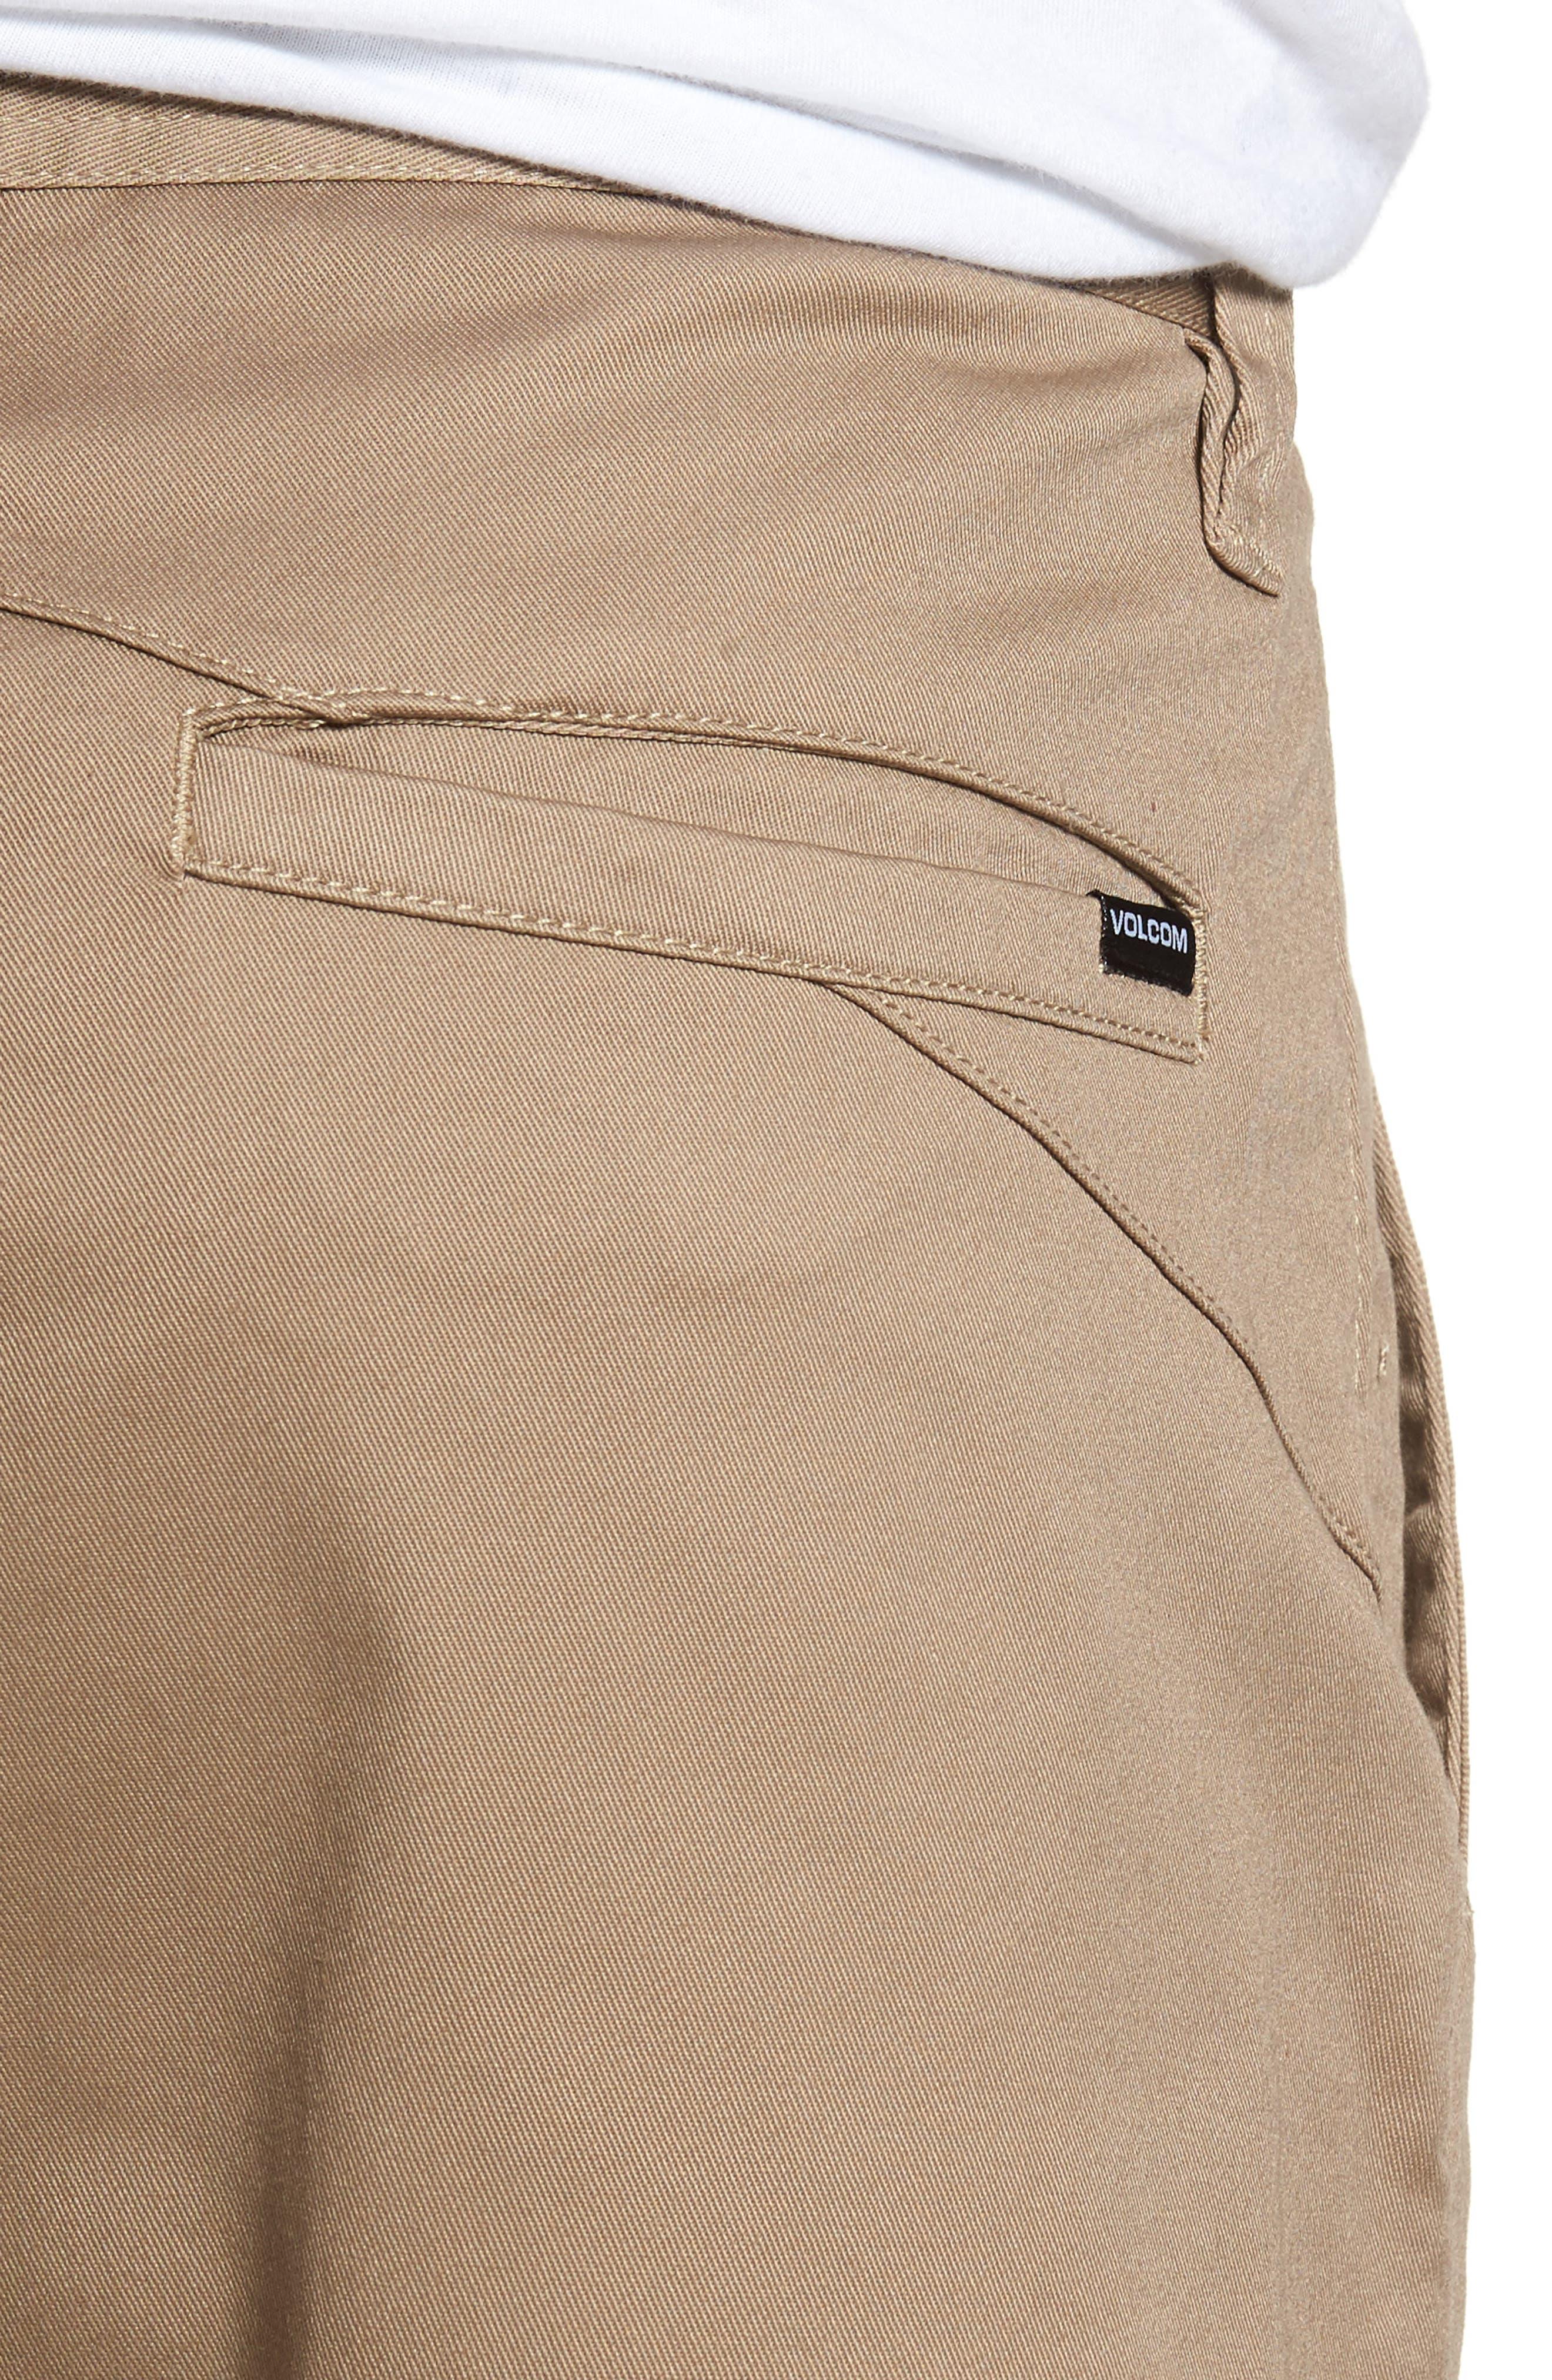 'Modern' Stretch Chino Shorts,                             Alternate thumbnail 50, color,